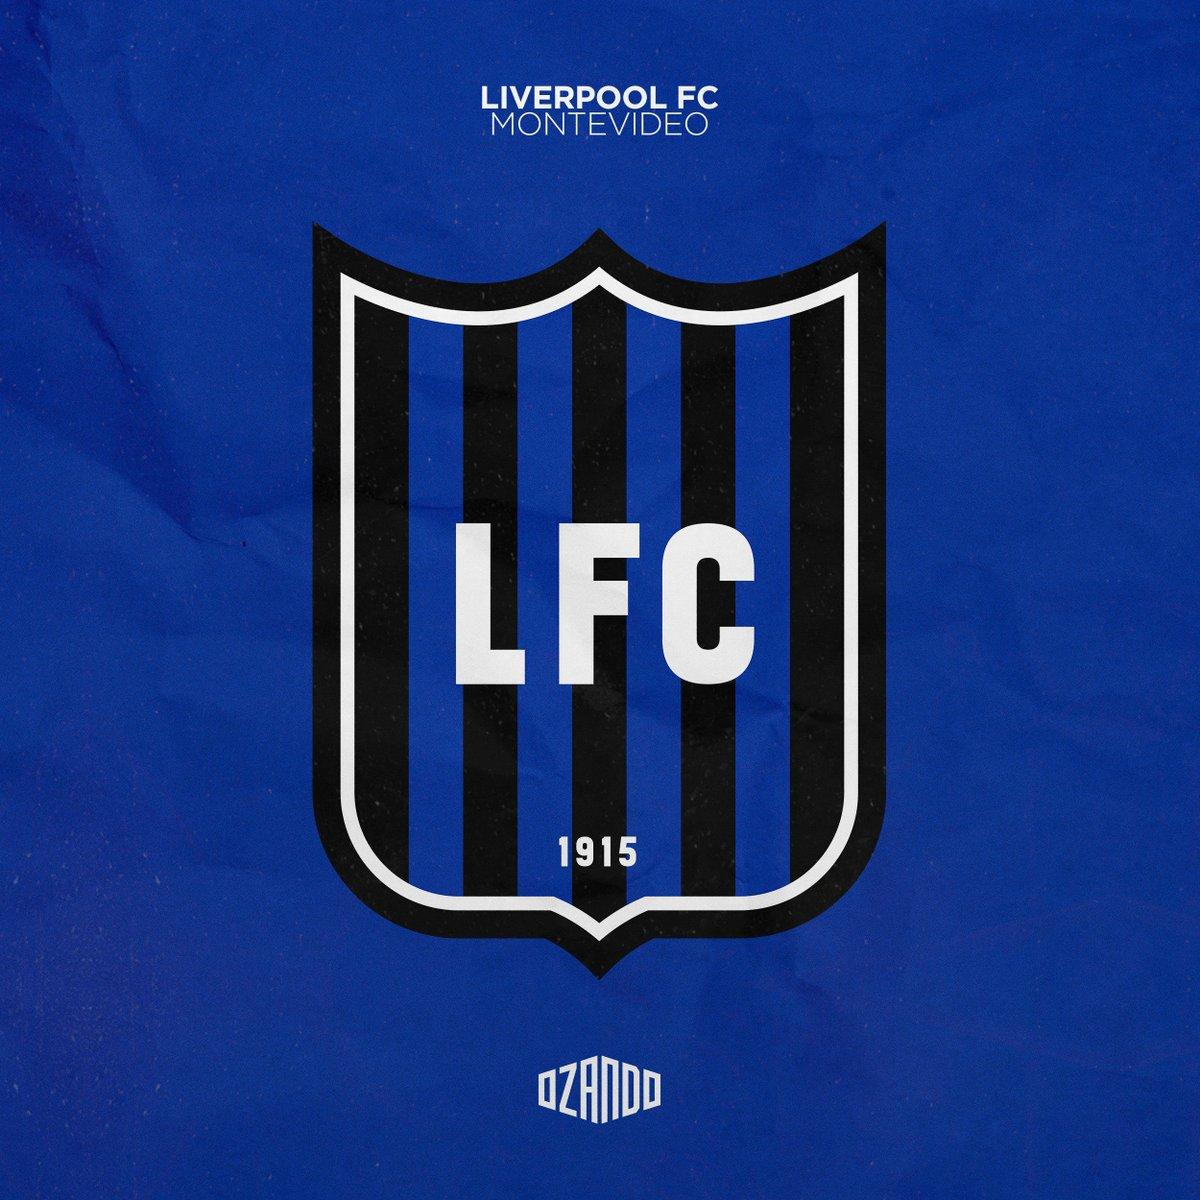 Ozando On Twitter Liverpool Fc Montevideo Crest Crcw 119 Designfootball Liverpoolfc1915